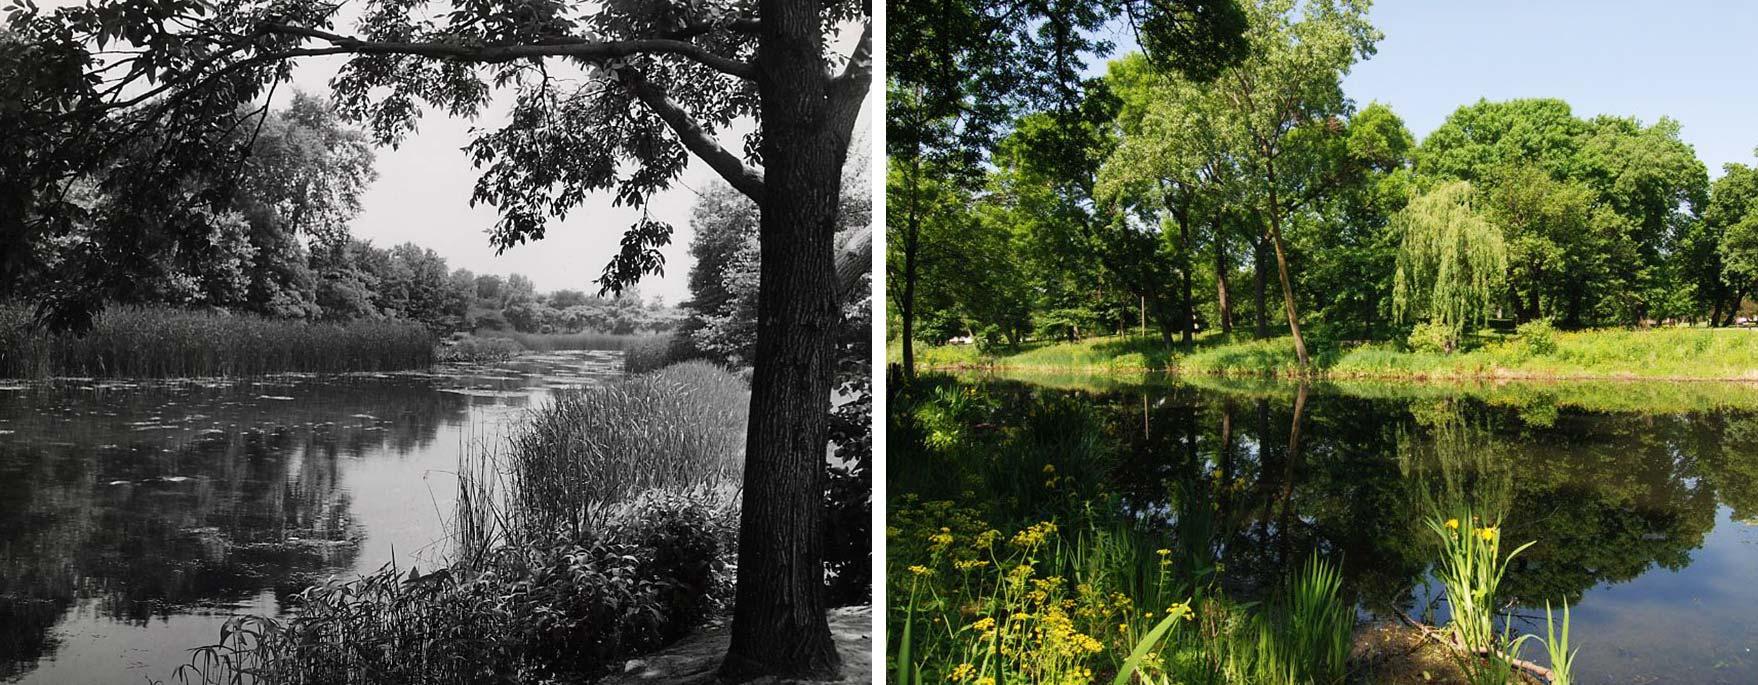 Left: Jens Jensen's Humboldt Park Prairie River, 1941. Chicago Park District Records: Photographs, Special Collections, Chicago Public Library. Right:Humboldt Park Prairie River, 2013. Photo by James Iska.